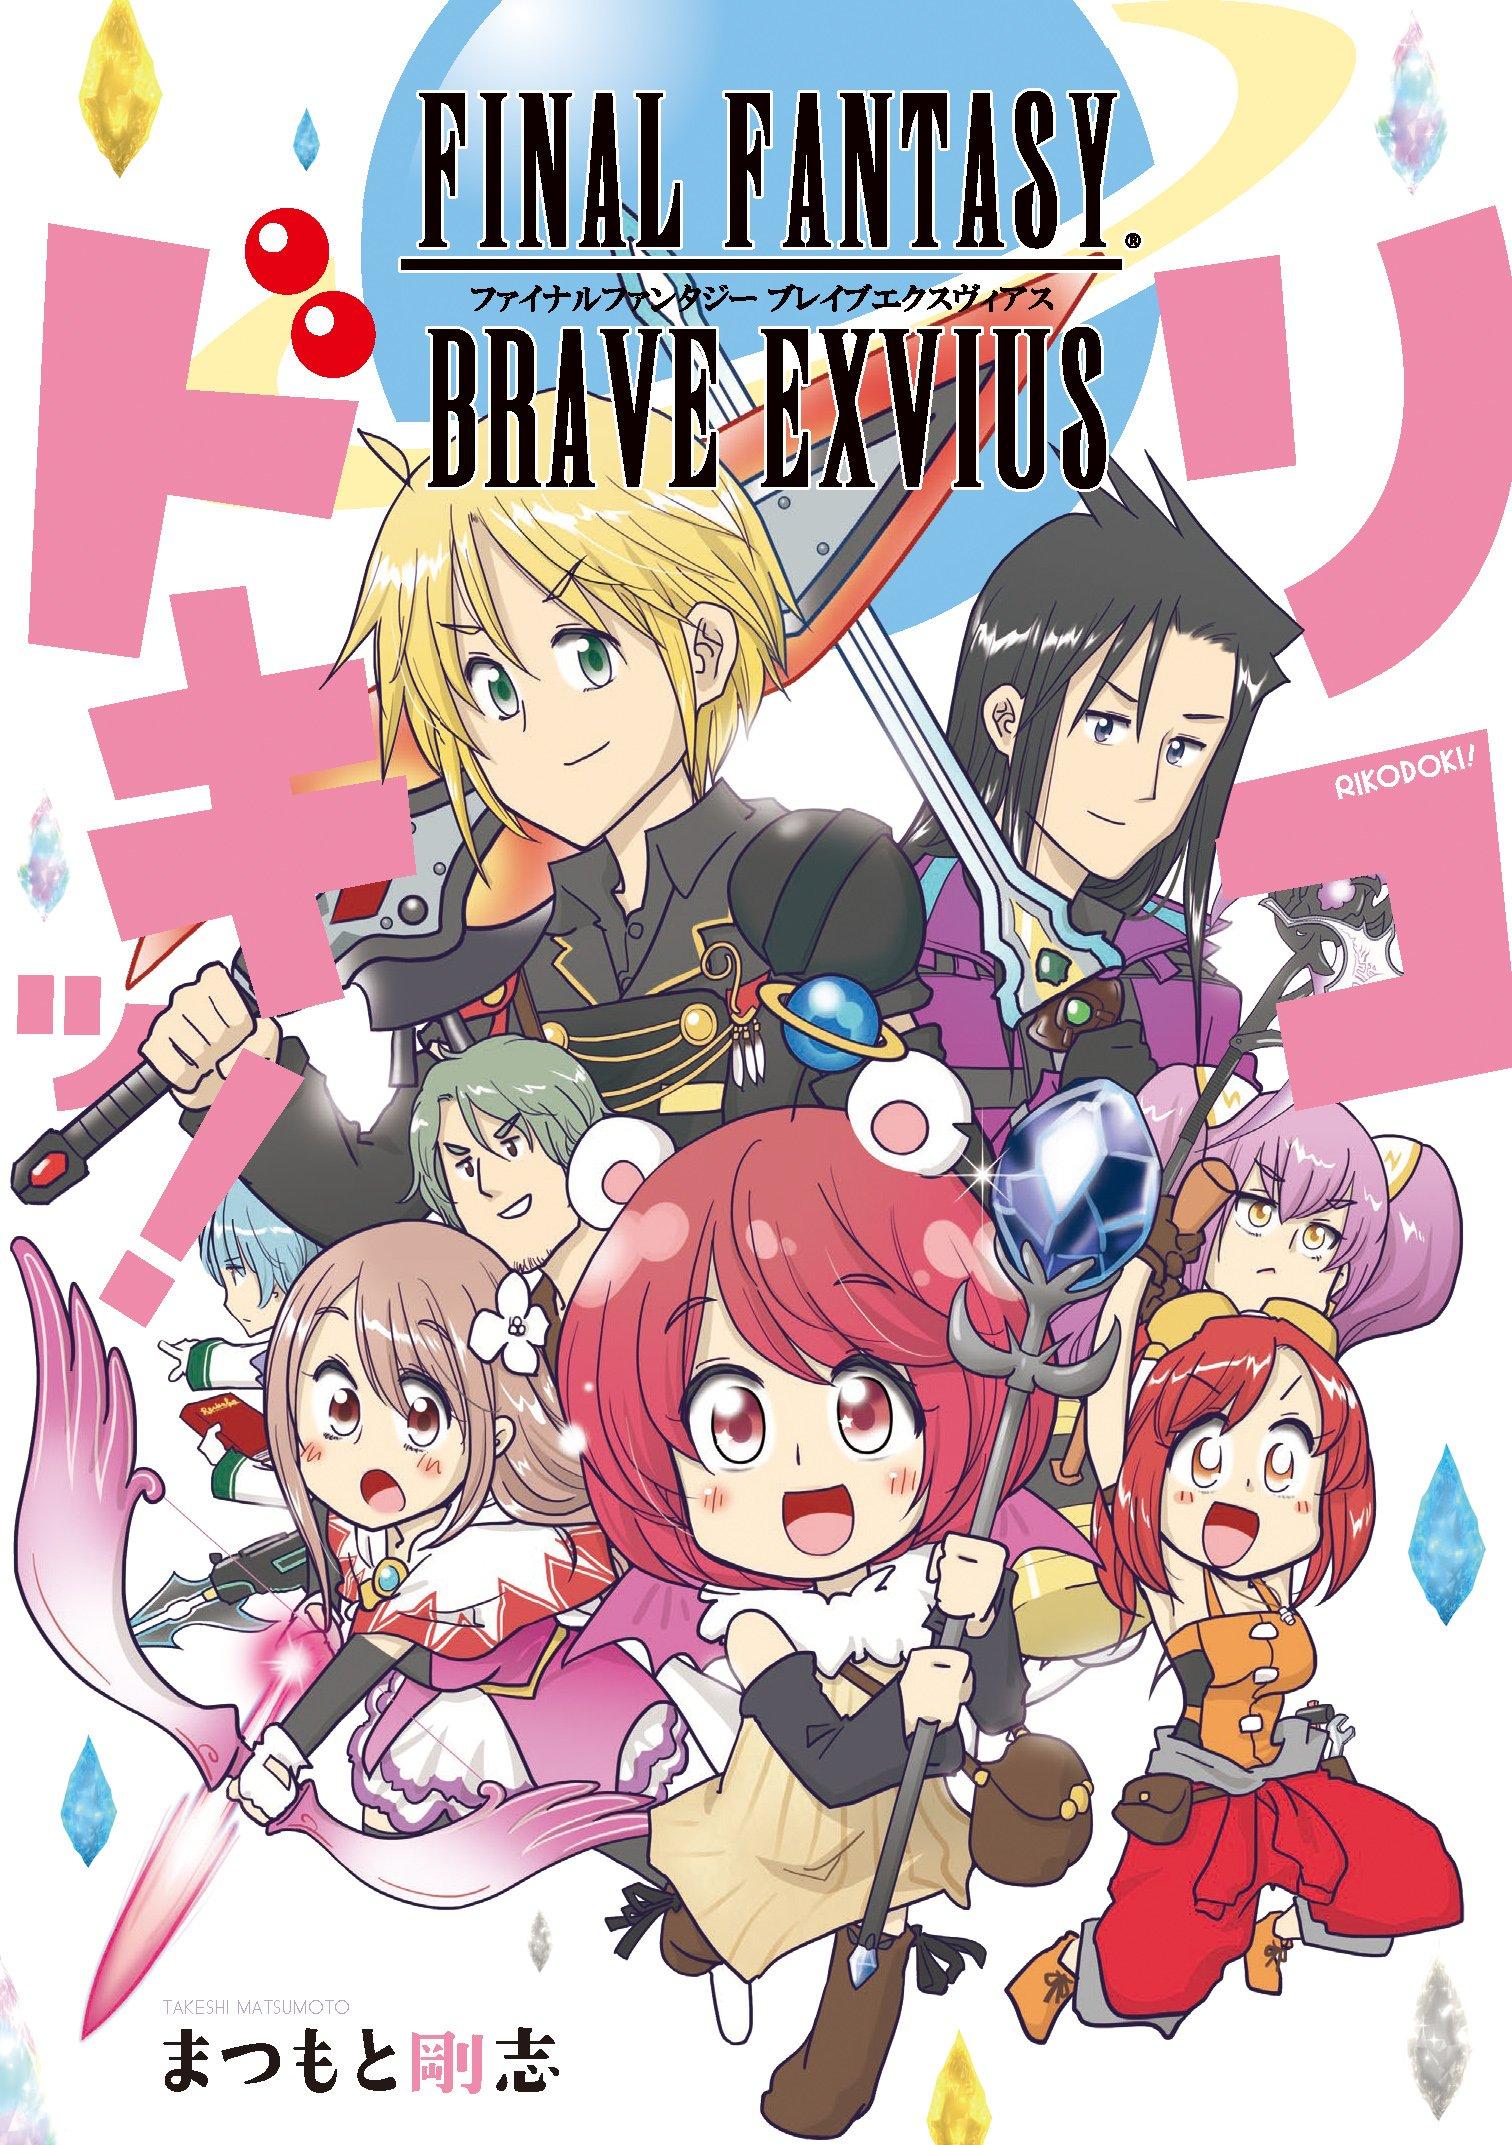 Final Fantasy Brave Exvius Rikodoki!